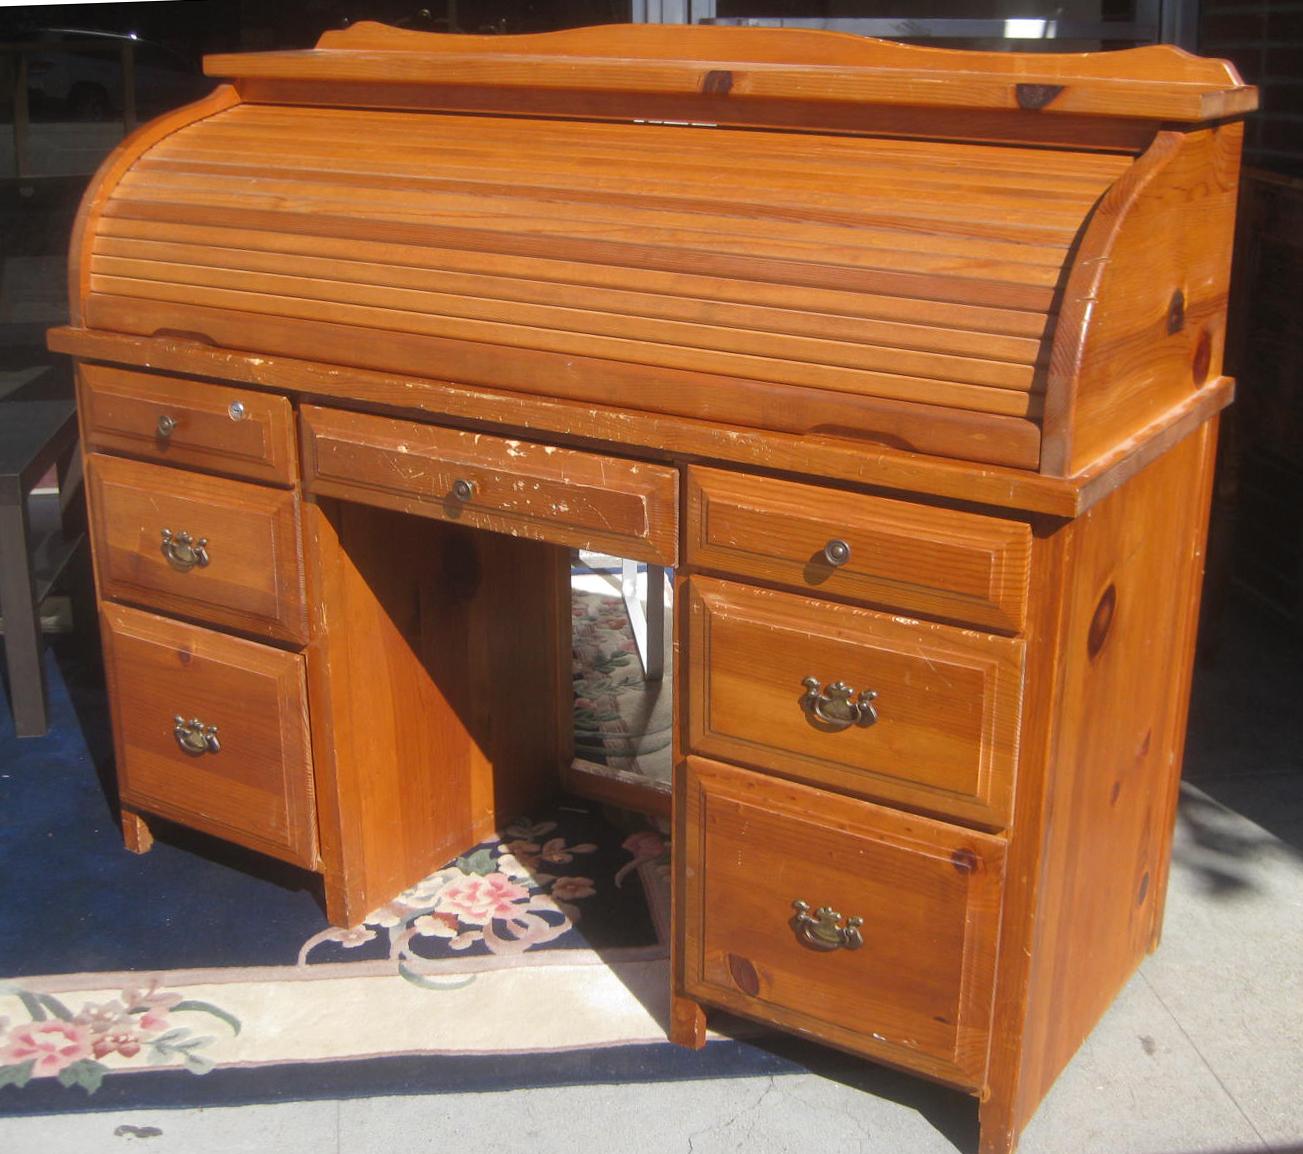 Antique Roll Top Desk - The Consortium, Vintage Furniture  Roll Top Desk